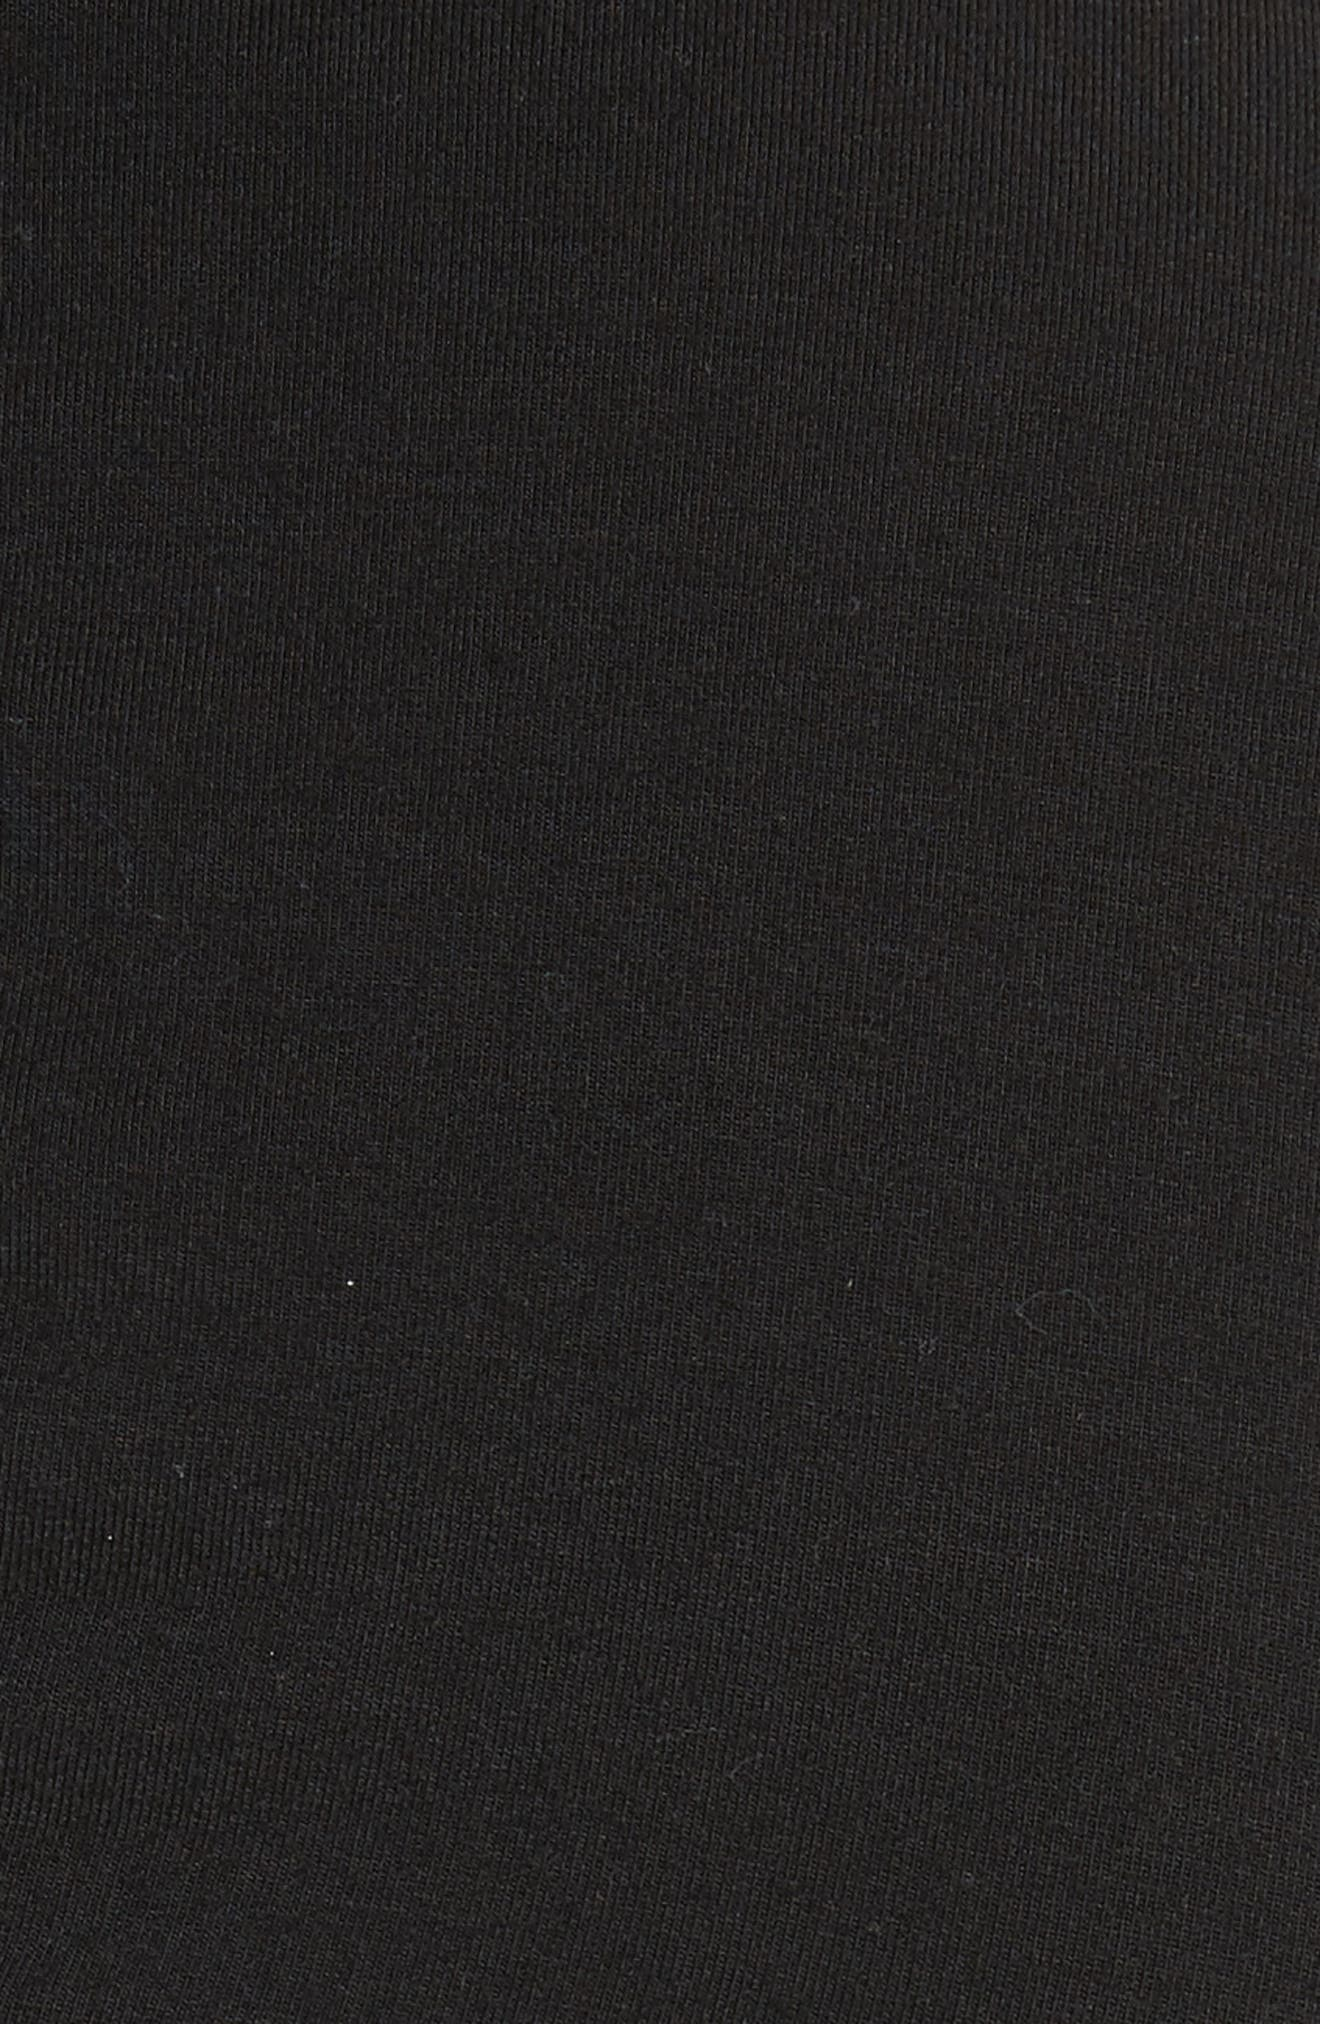 Cutout Stretch Jersey Dress,                             Alternate thumbnail 5, color,                             001